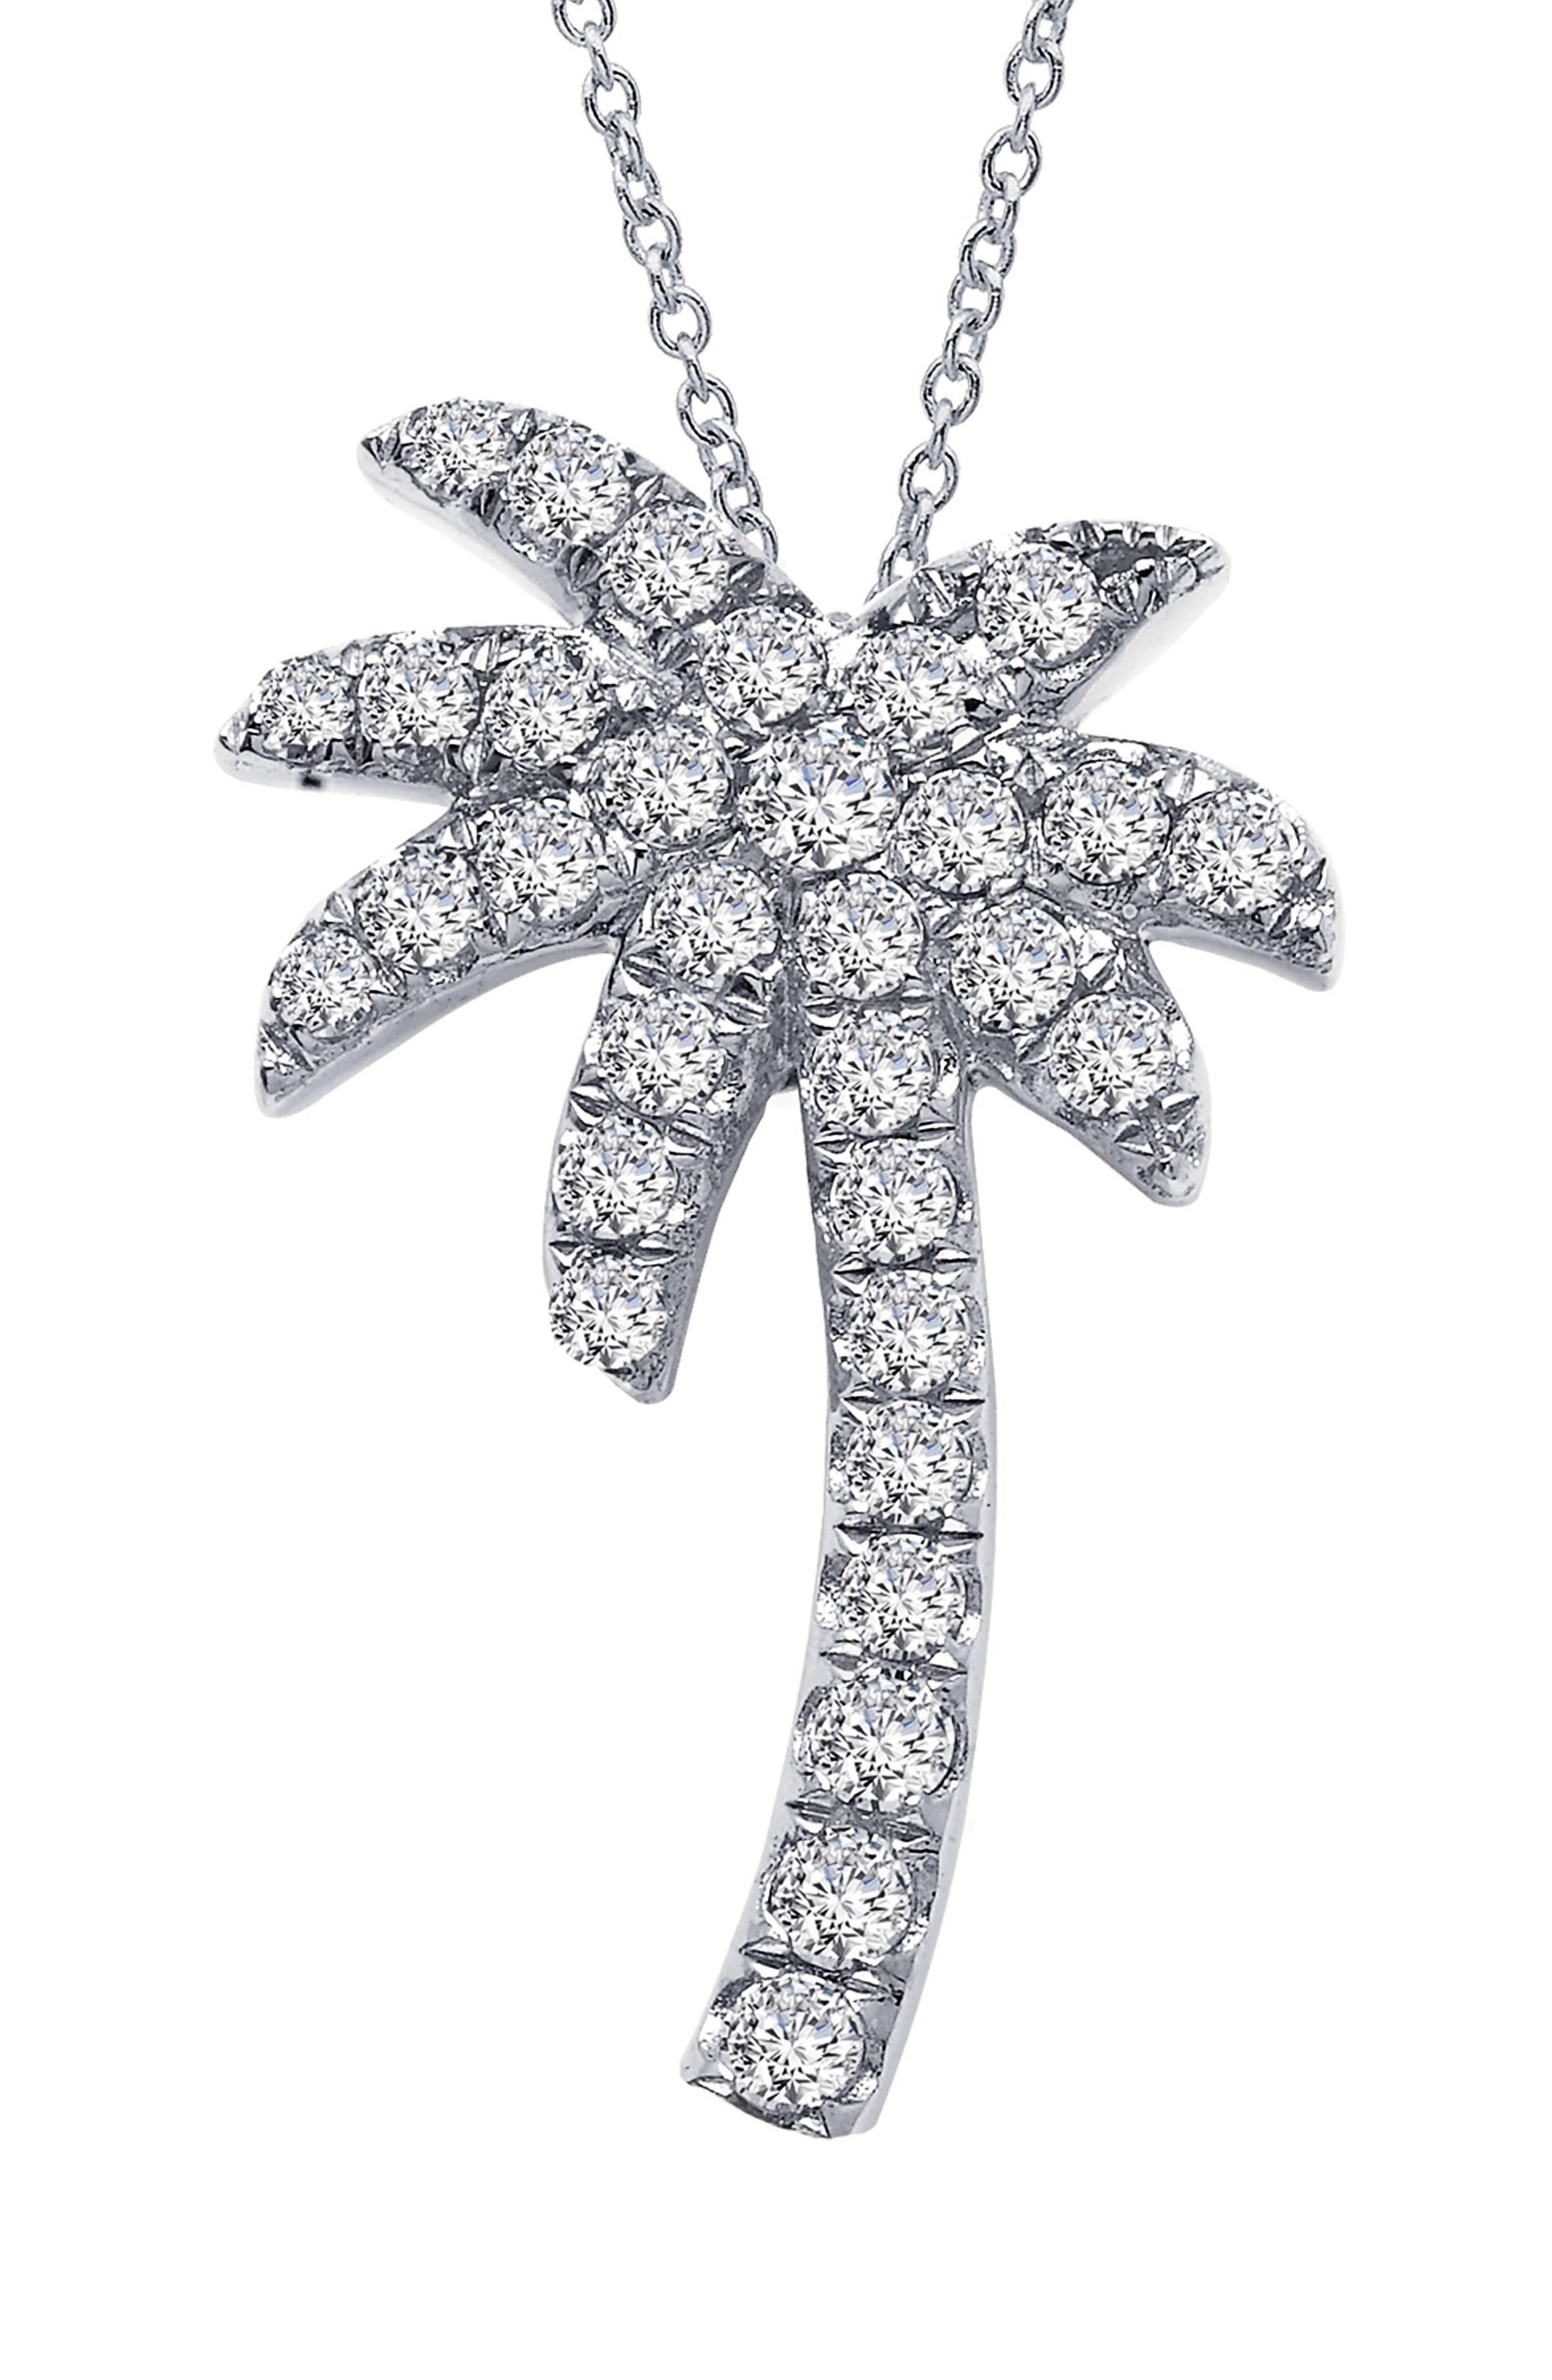 Palm Tree Simulated Diamond Pendant Necklace,                         Main,                         color, SILVER